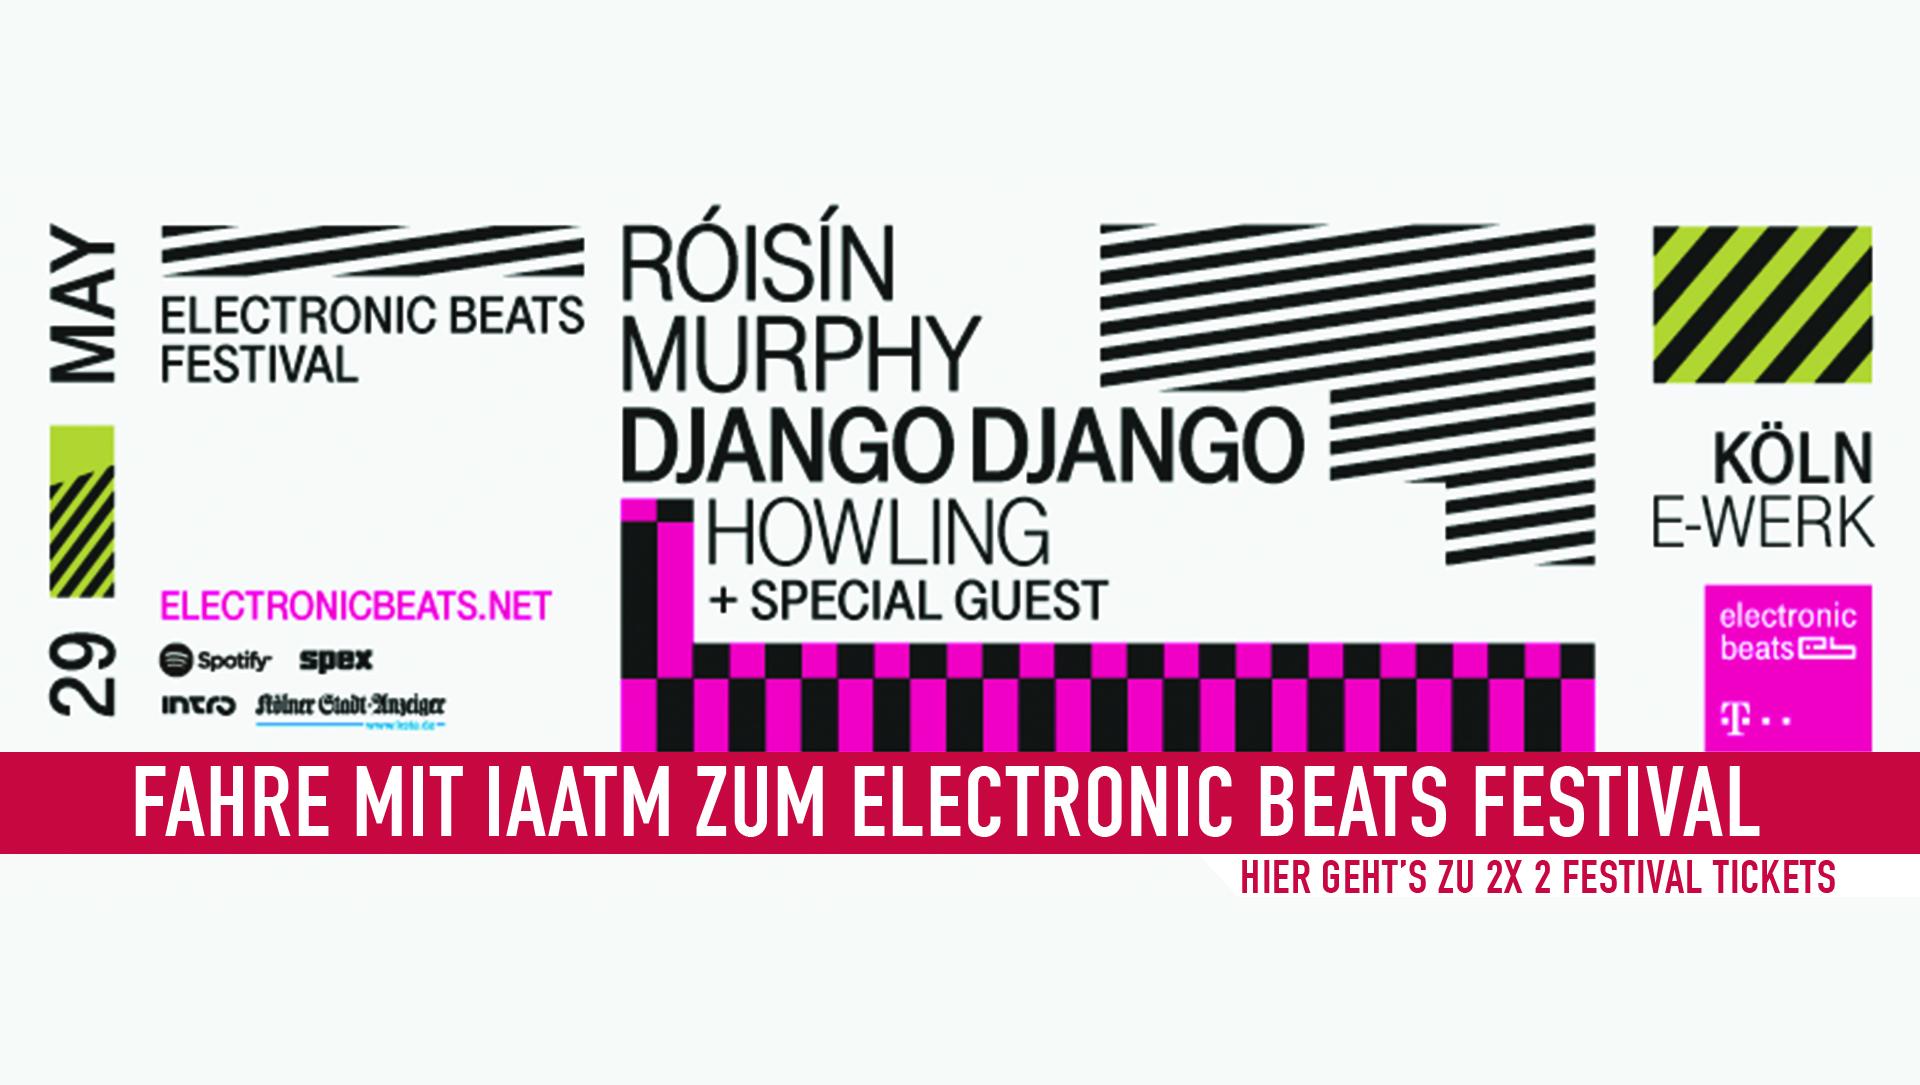 Gewinne 2x 2 Tickets für das Electronic Beats Festival (Köln)